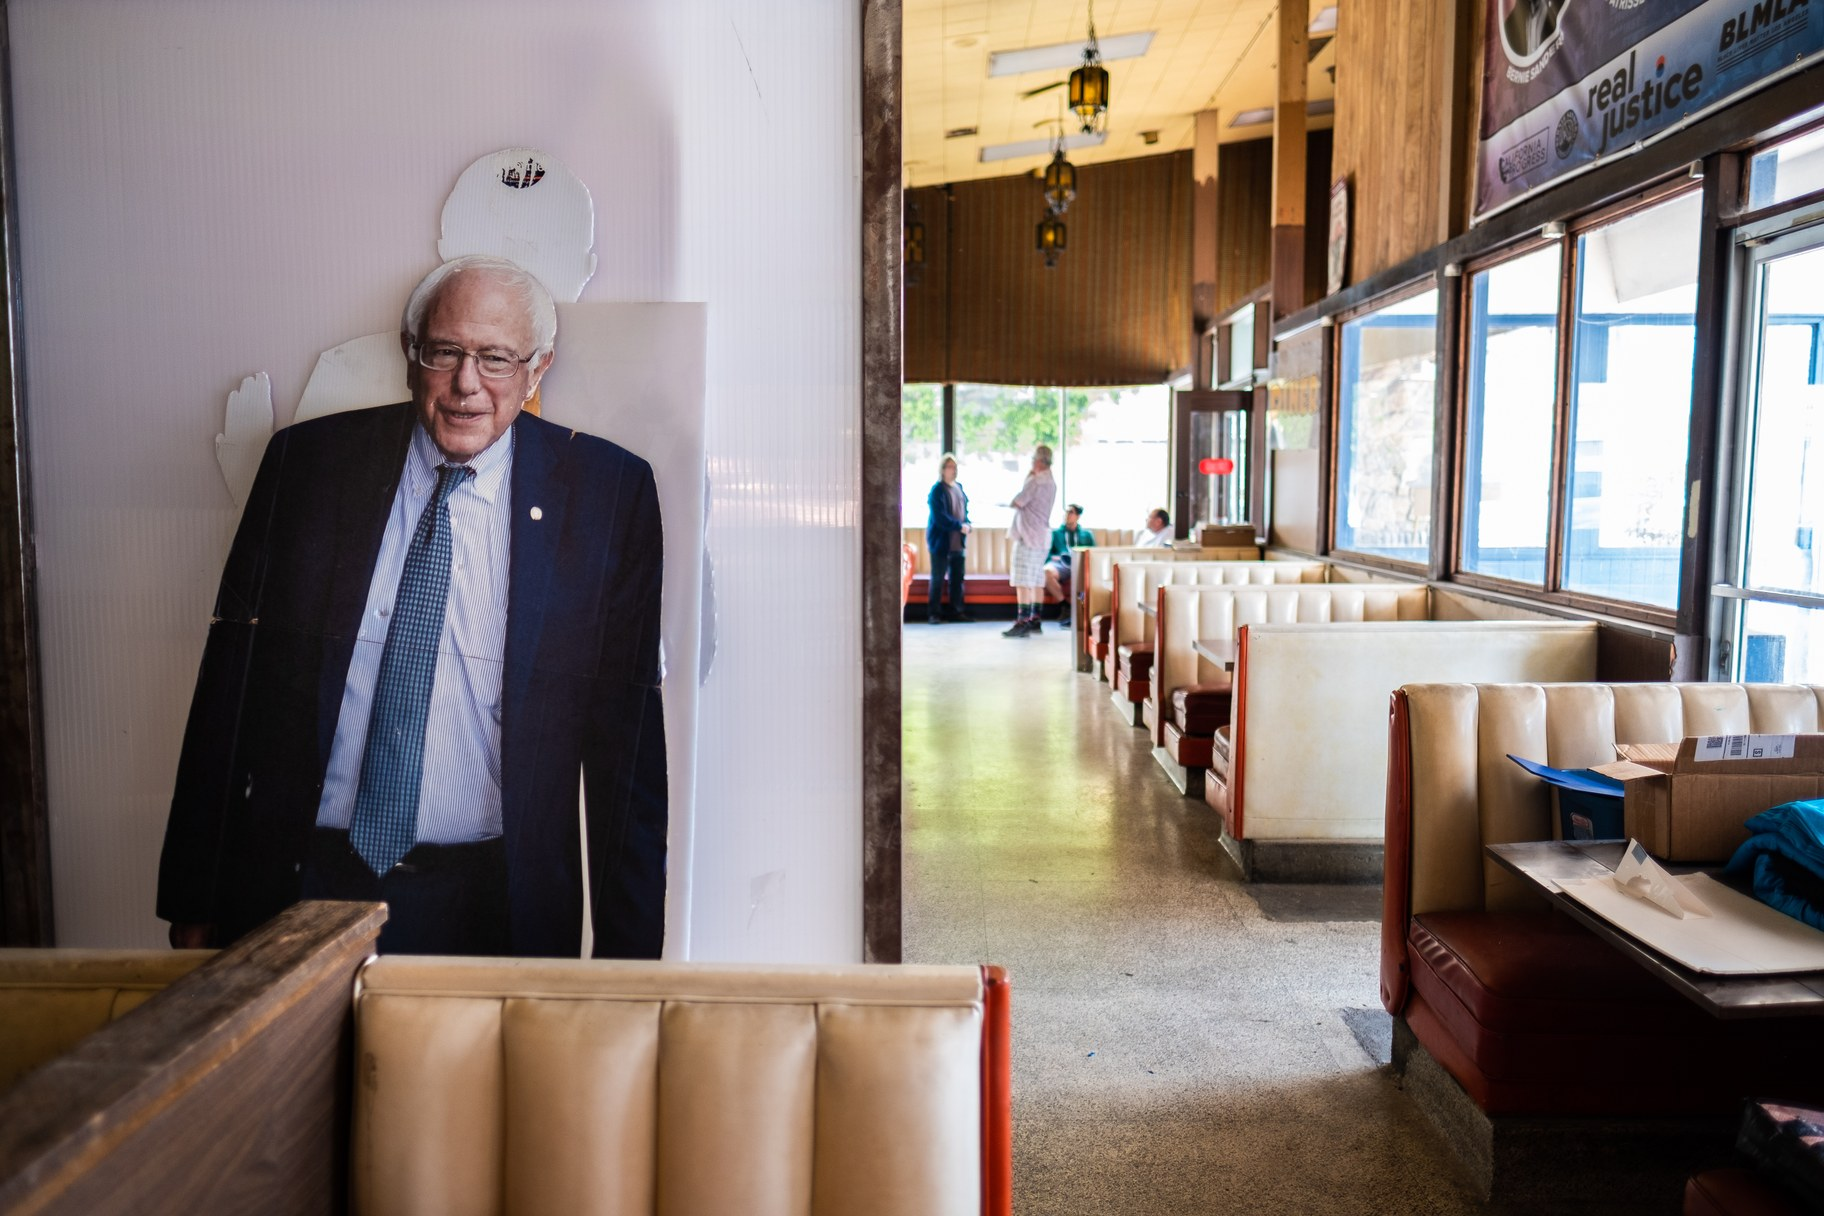 Bernie_s Coffee Shop_ATa 8.jpg